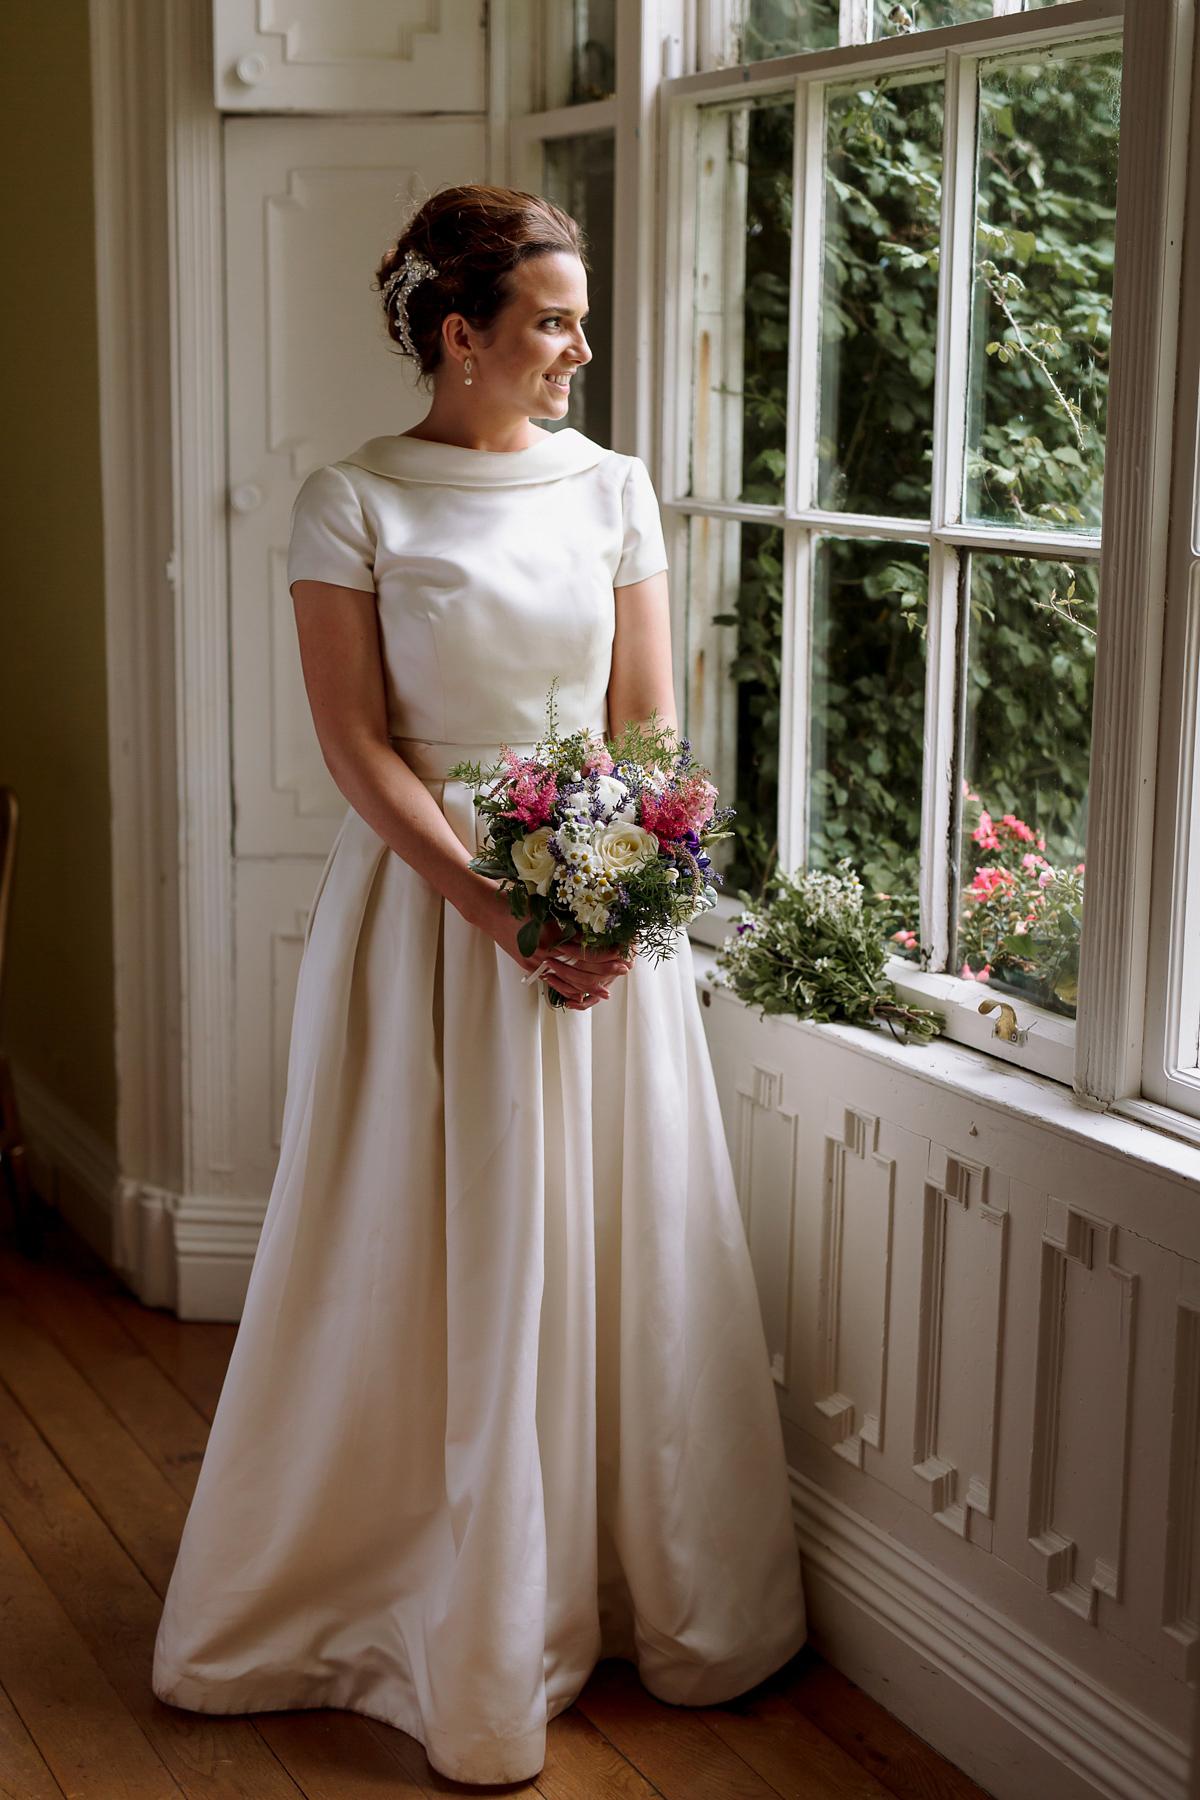 Celia by Pronovias for an Elegant Country House Wedding